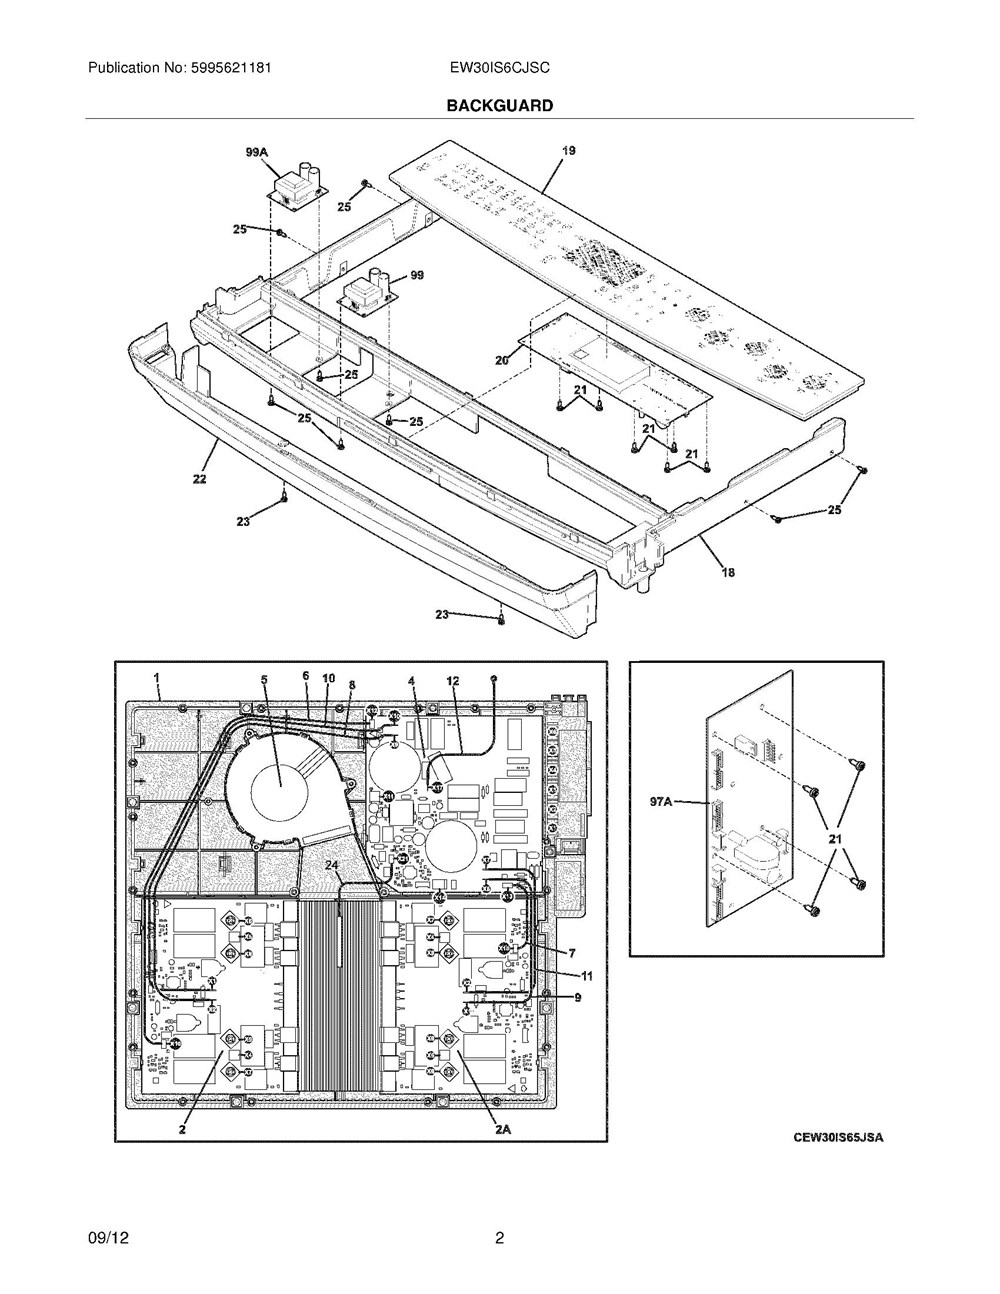 Ew30is6cjsc Frigidaire Company Backguard 05body 07top Drawer 09door 01cover 10wiring Diagram